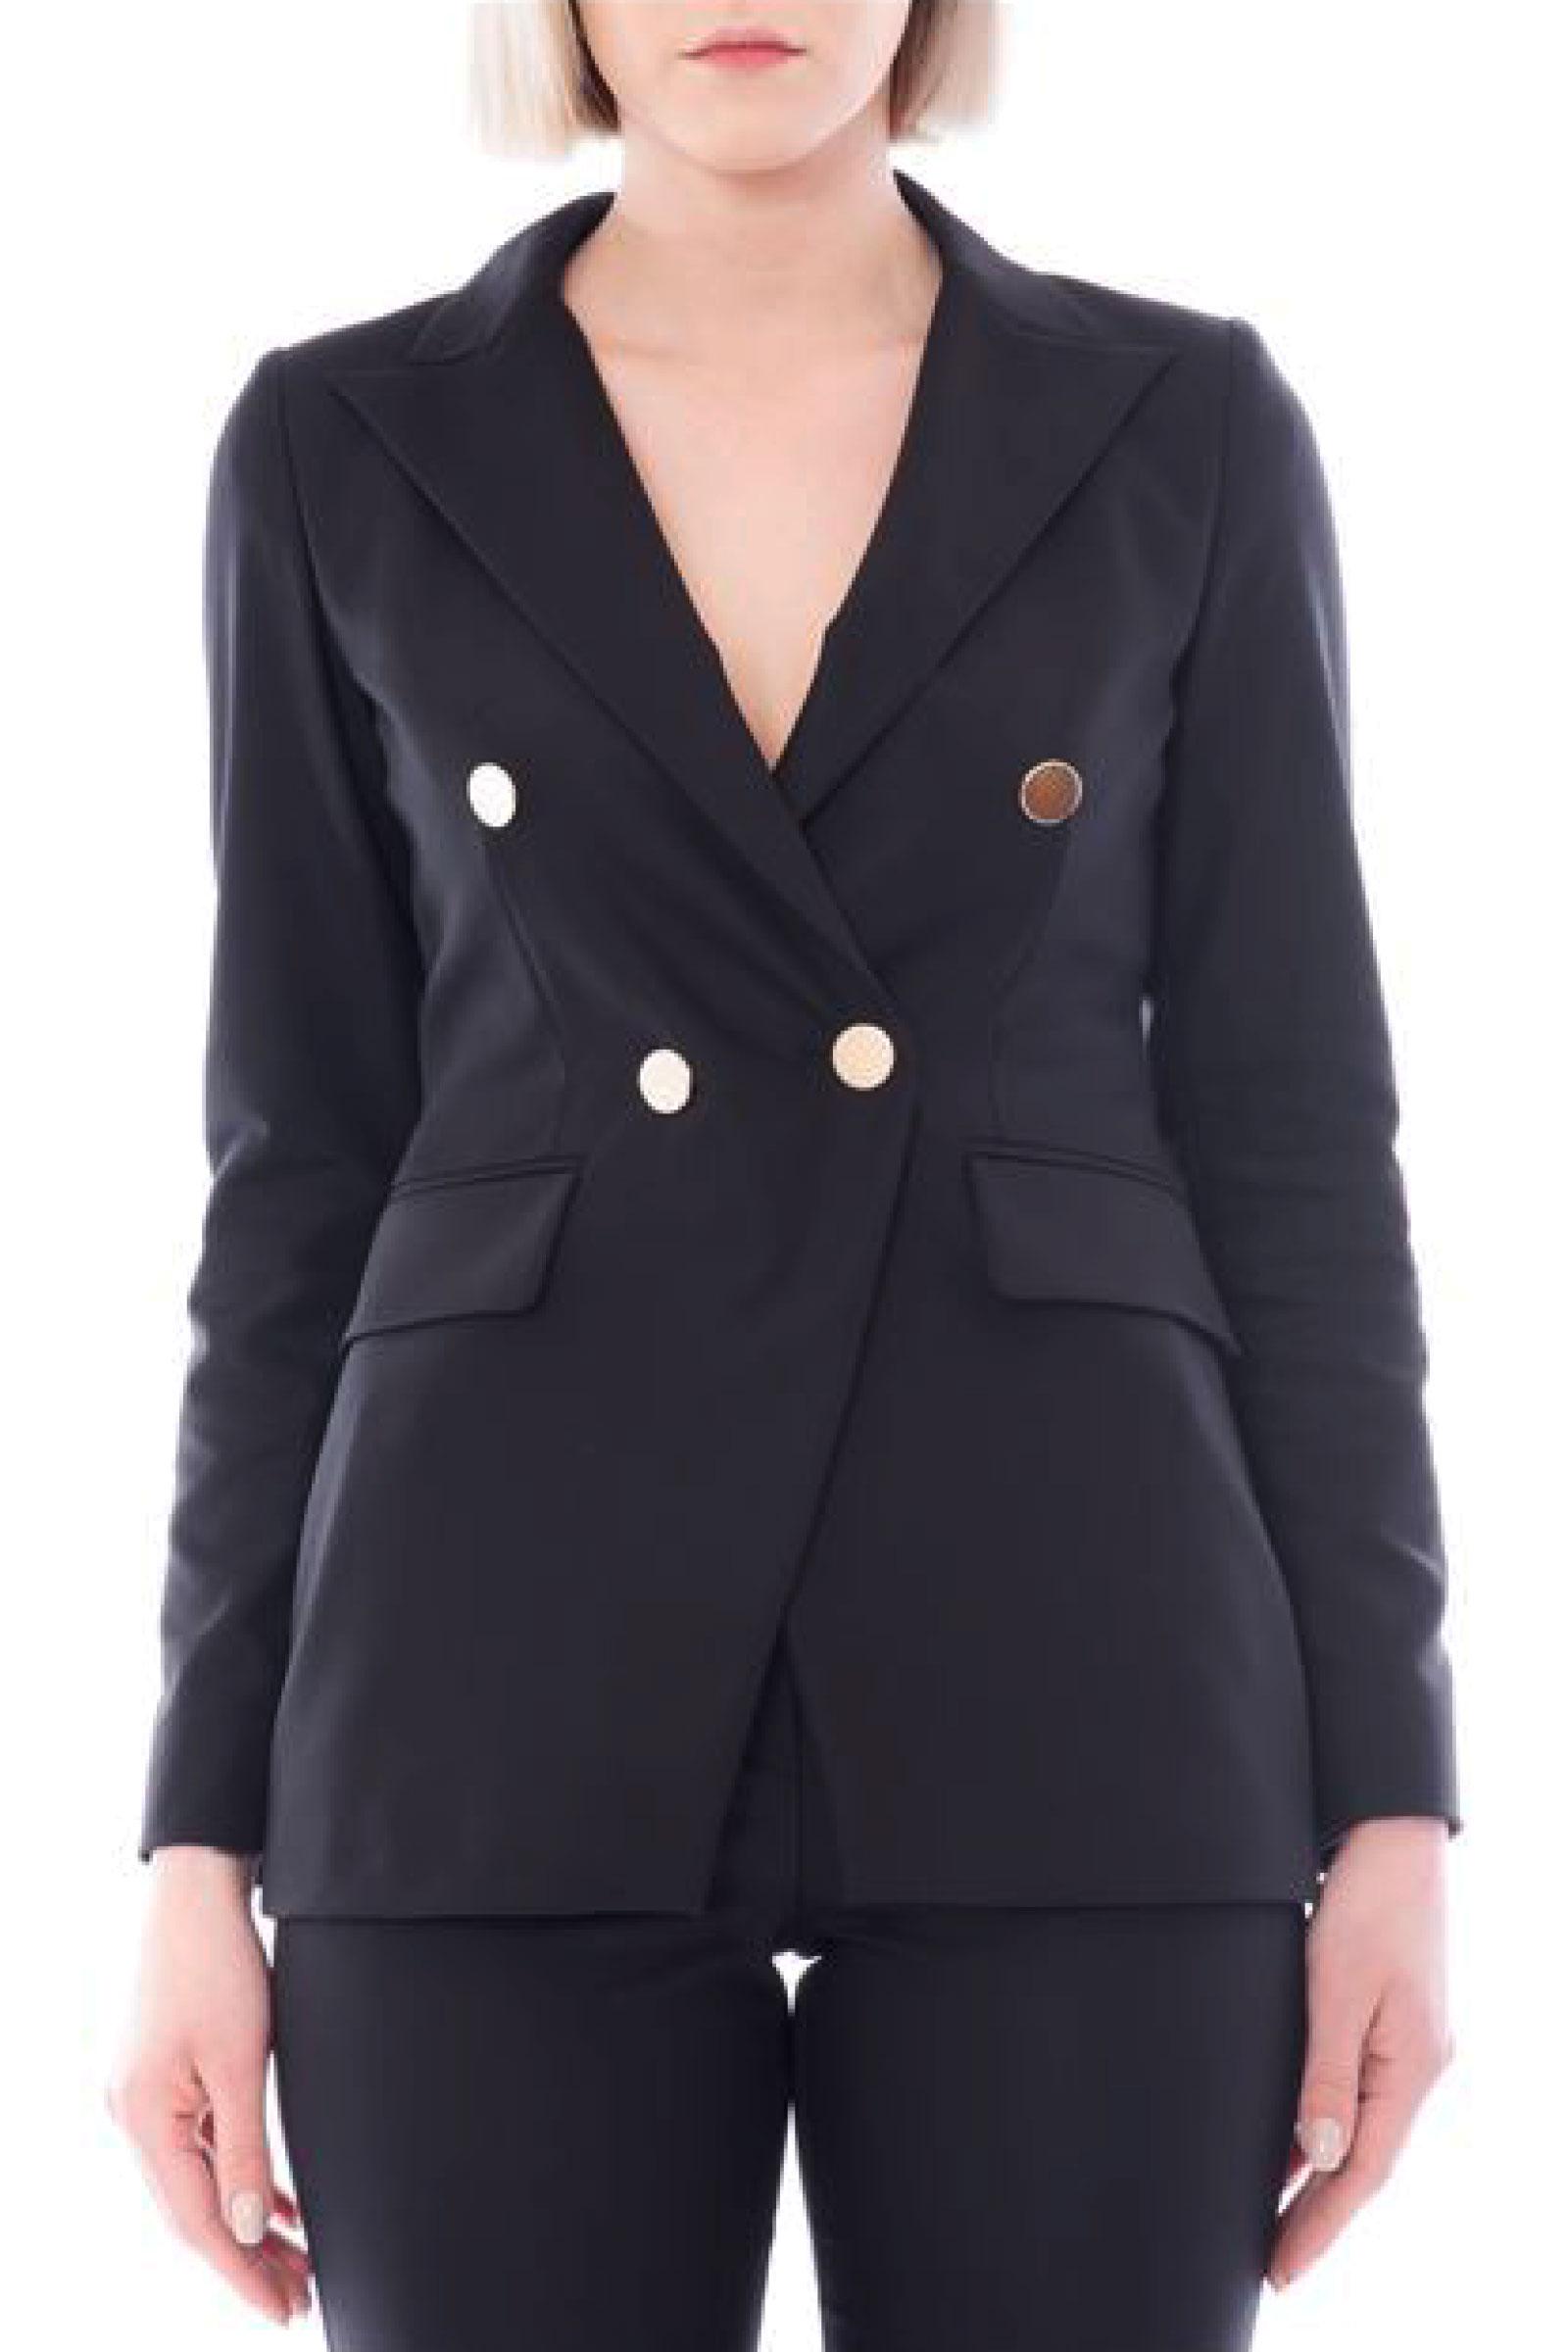 EMME MARELLA giacca modello AUSONIA EMME MARELLA | Giacca | 50411615000004